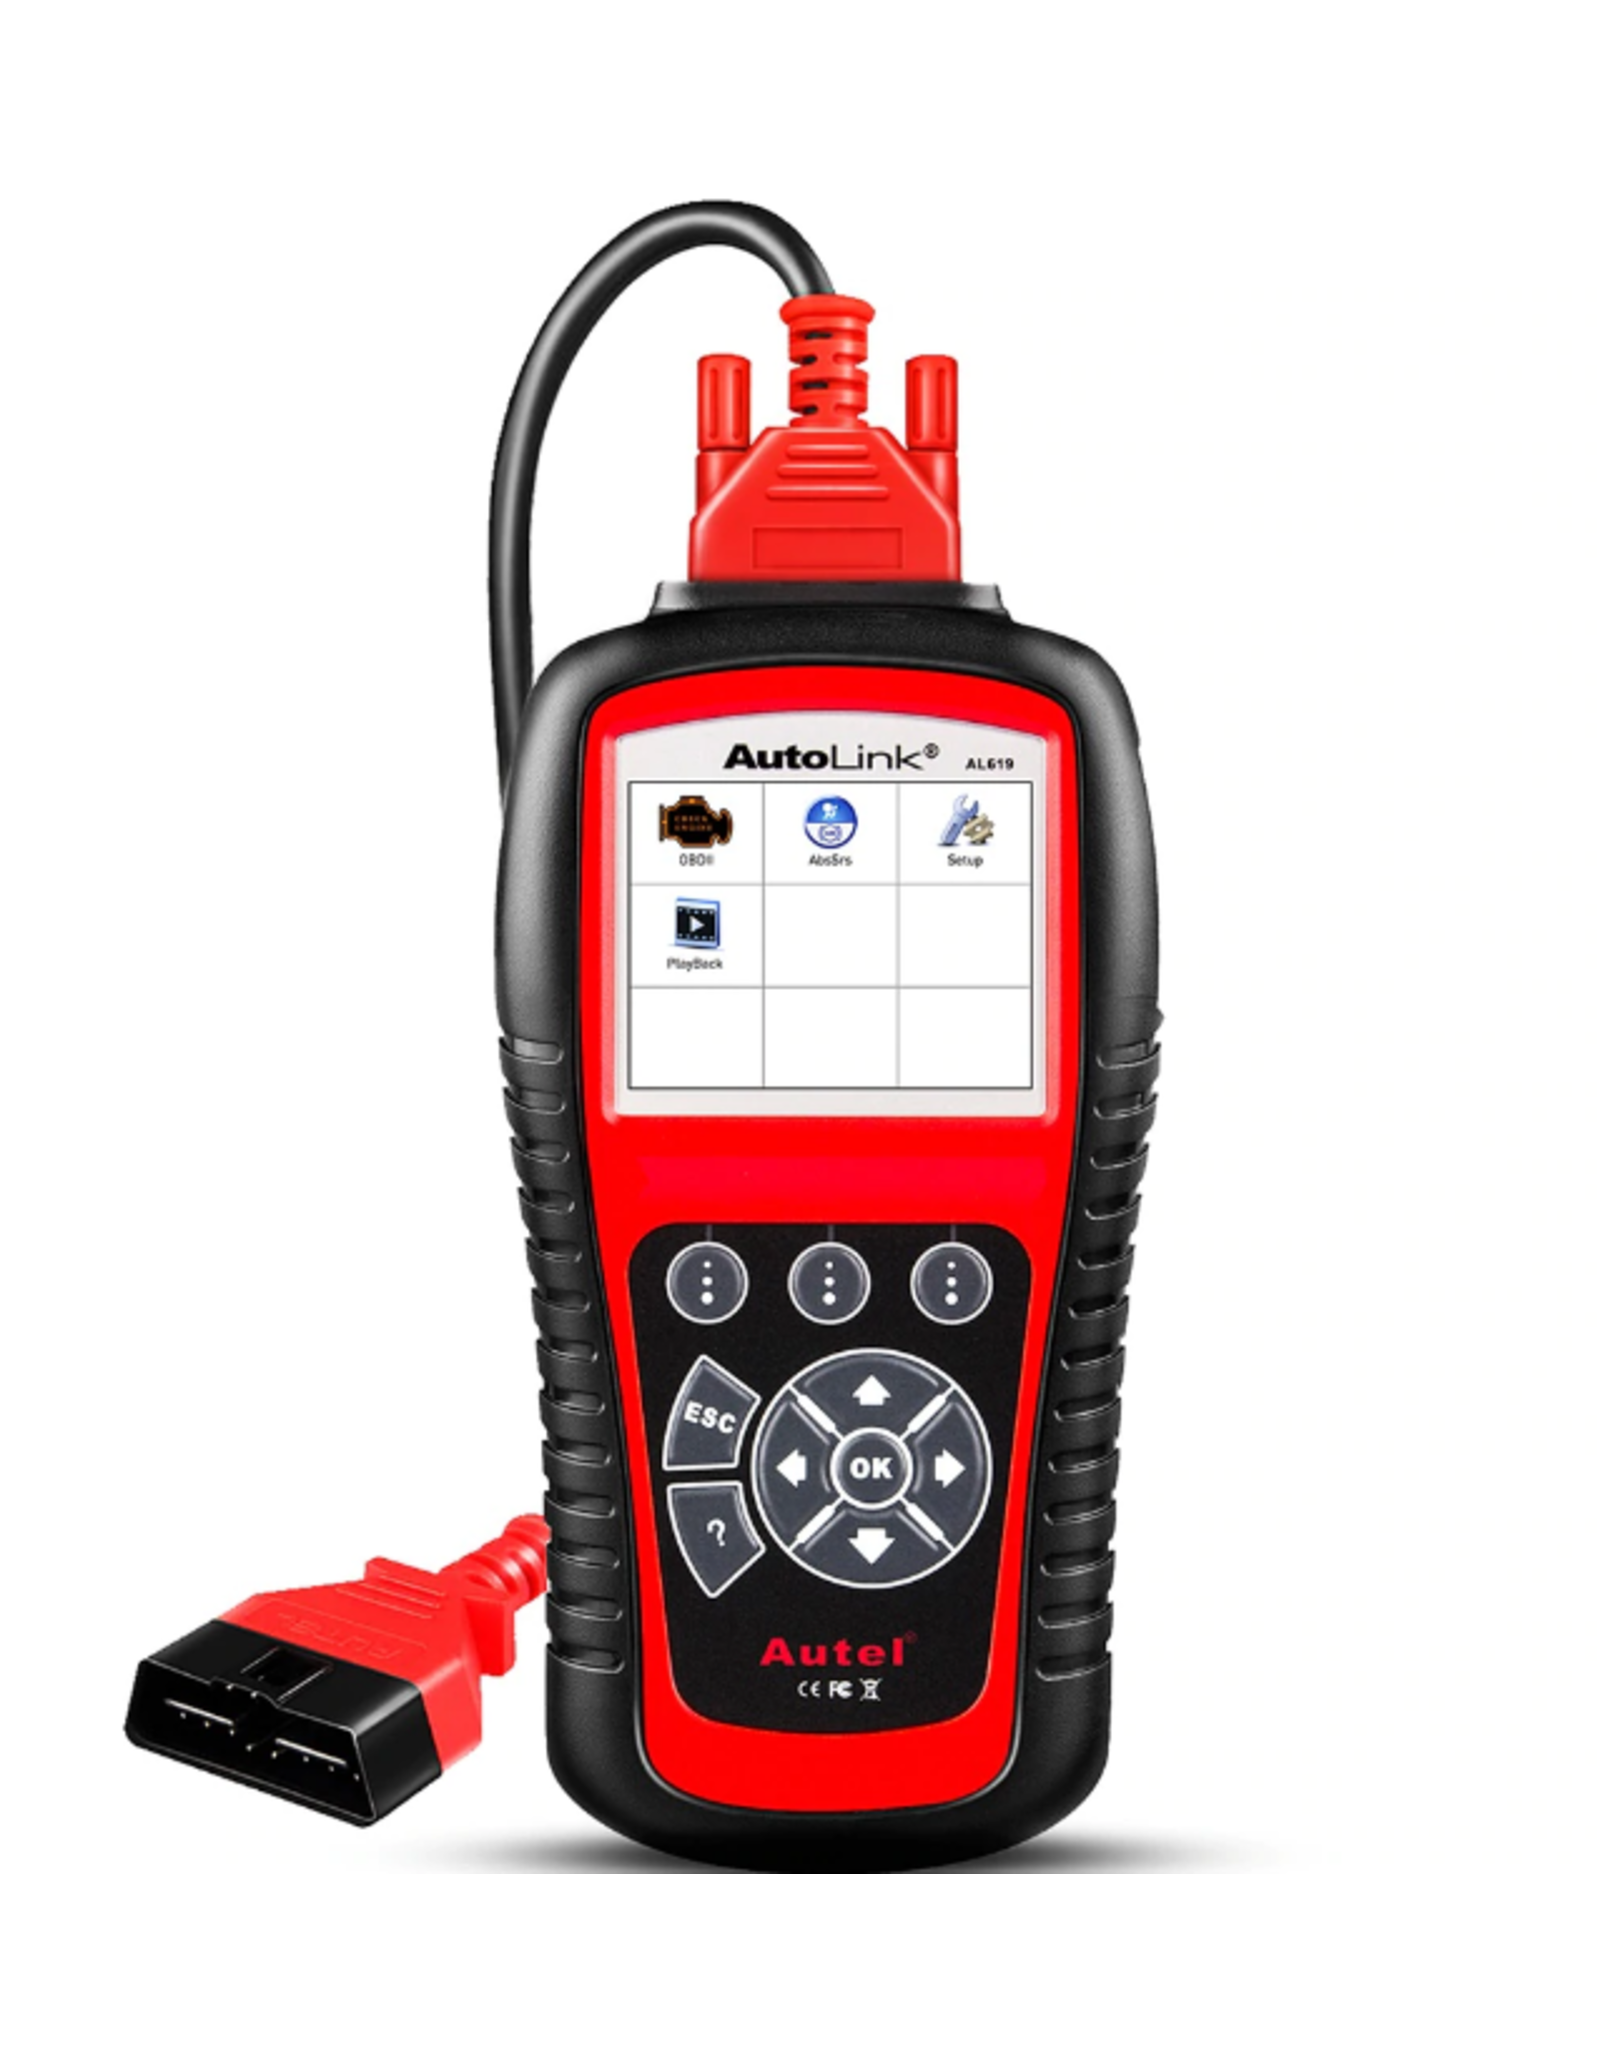 OBD-scanner - OBD2 – OBDII – Diagnose scanner - Diagnosecomputer - Autel AL619